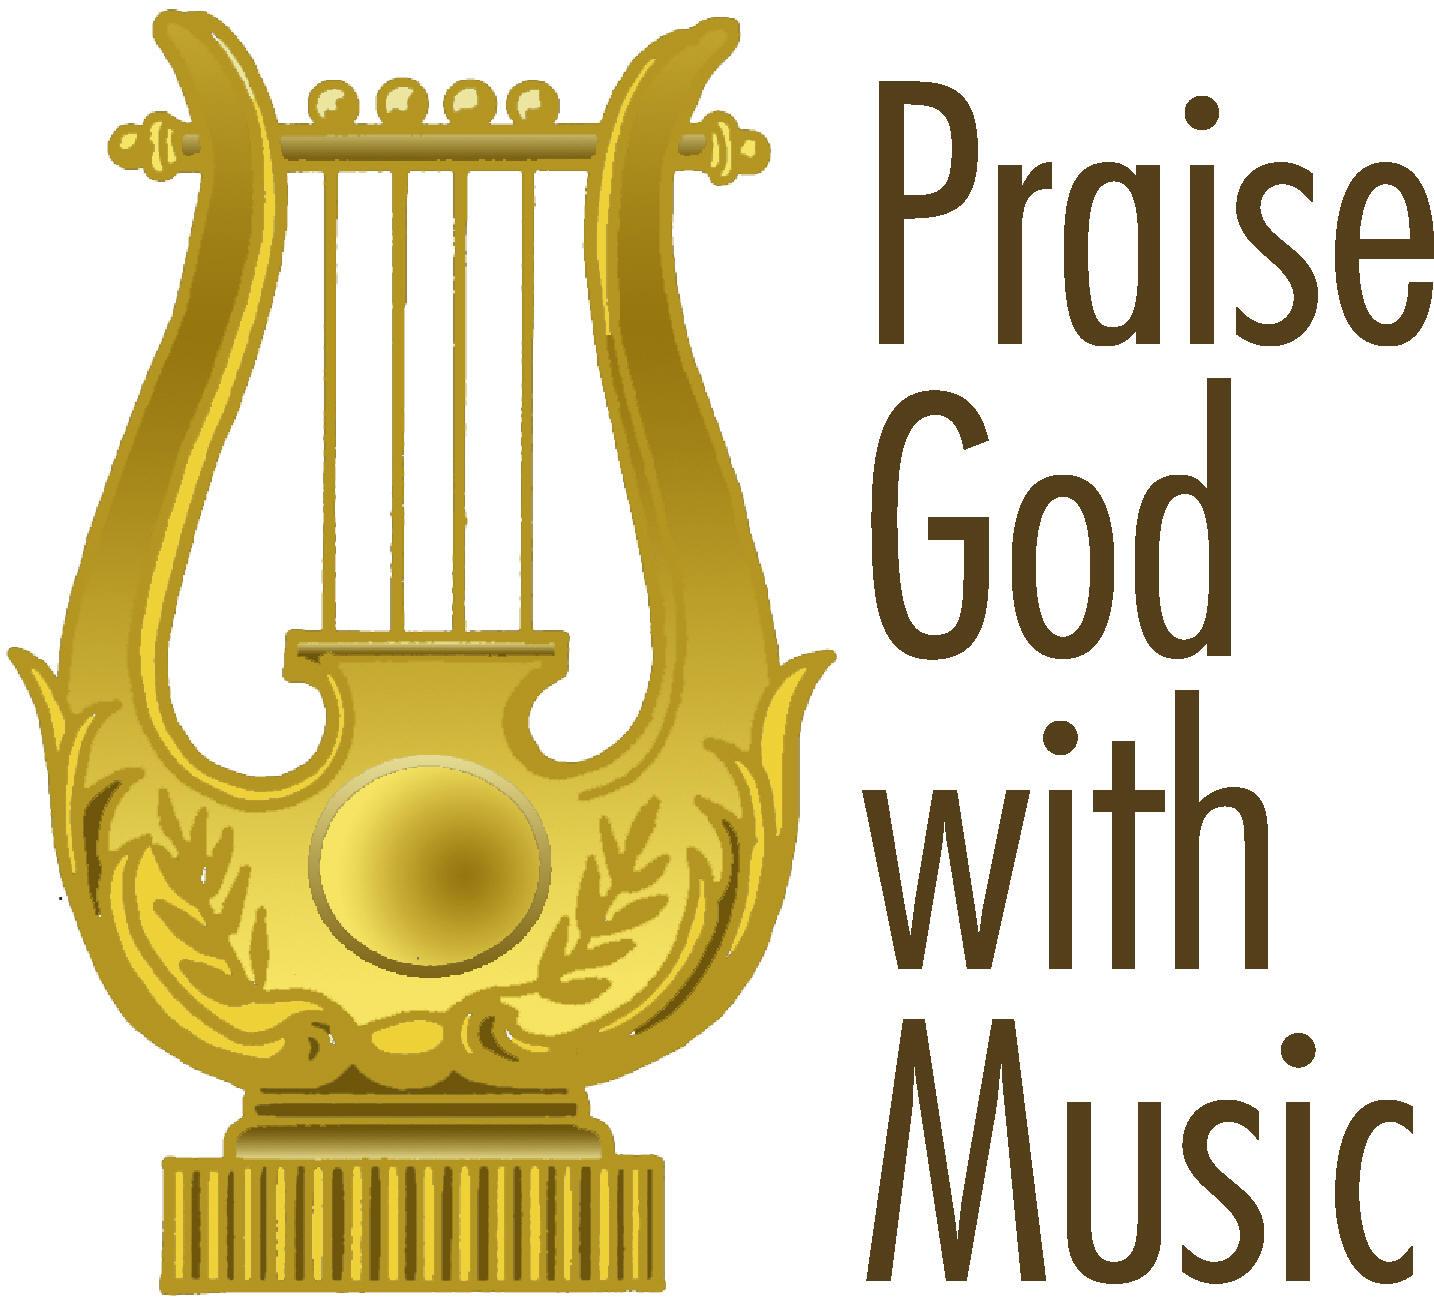 clipart church music clipart best free christian youth ministry clipart youth ministry clip art/verses on wisdom